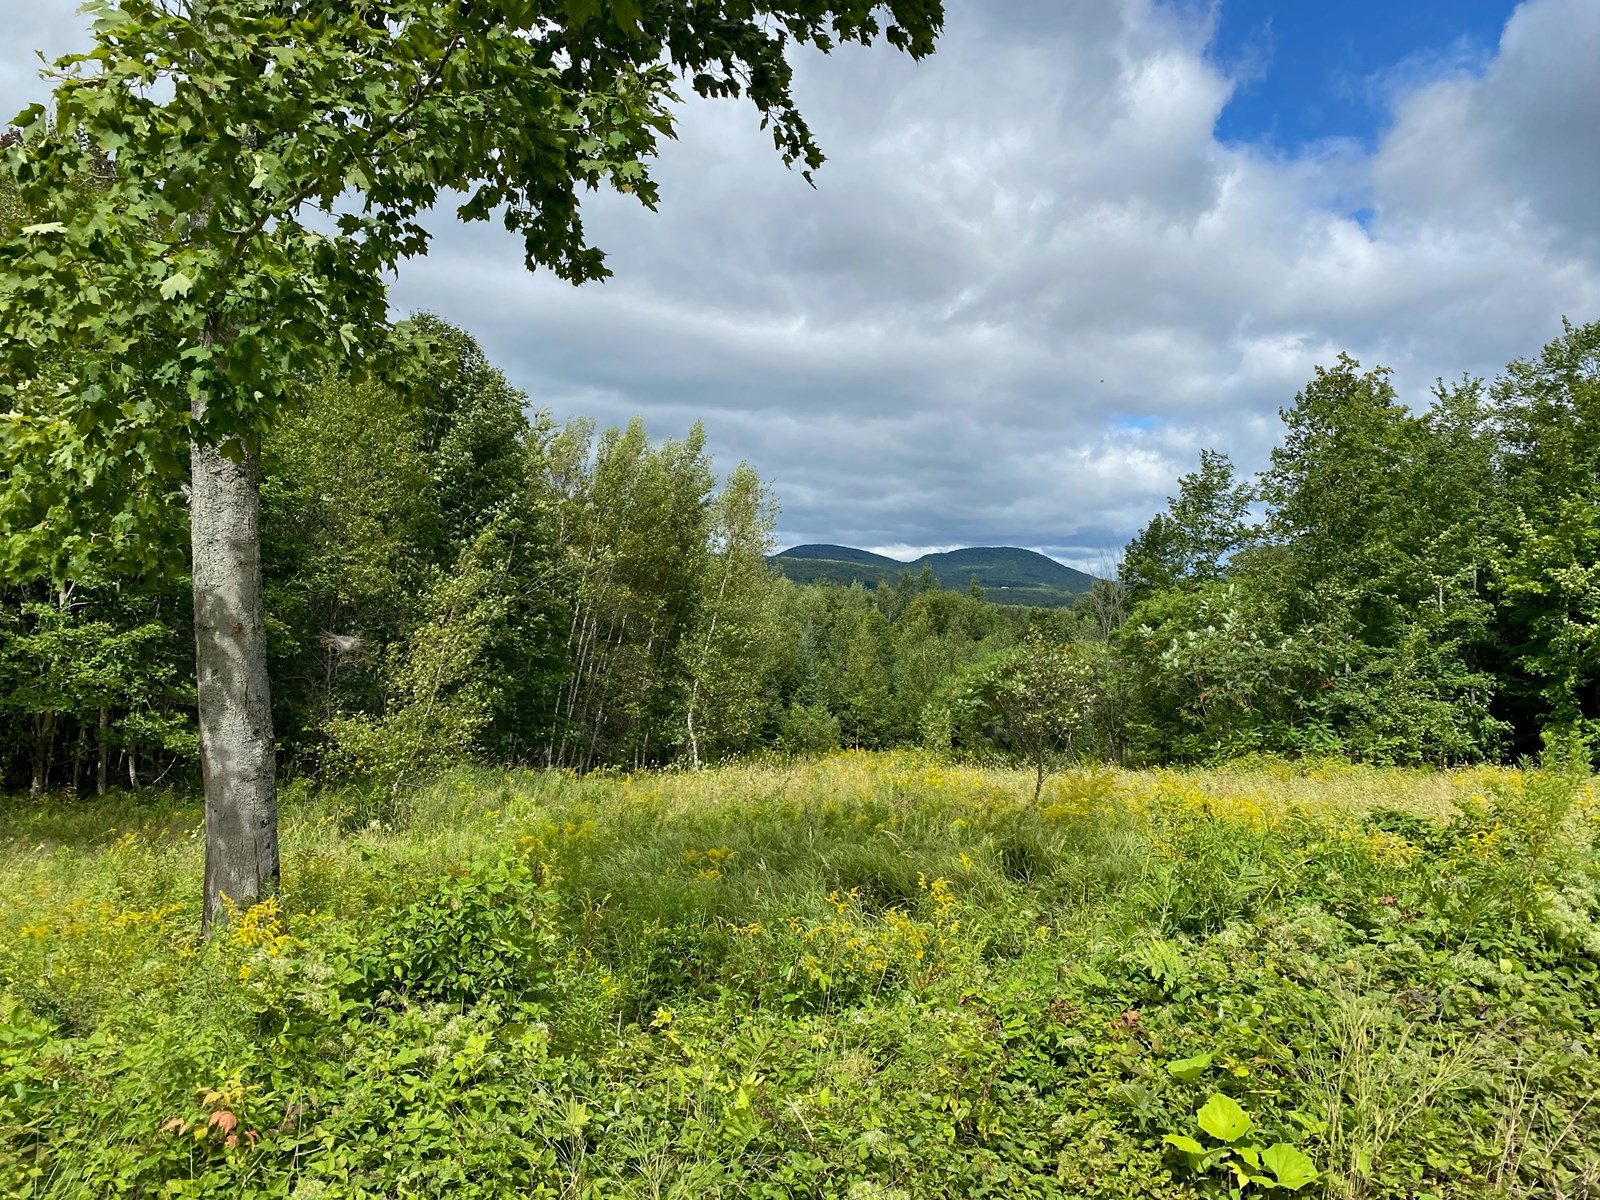 Land for Sale in Farmington, Maine